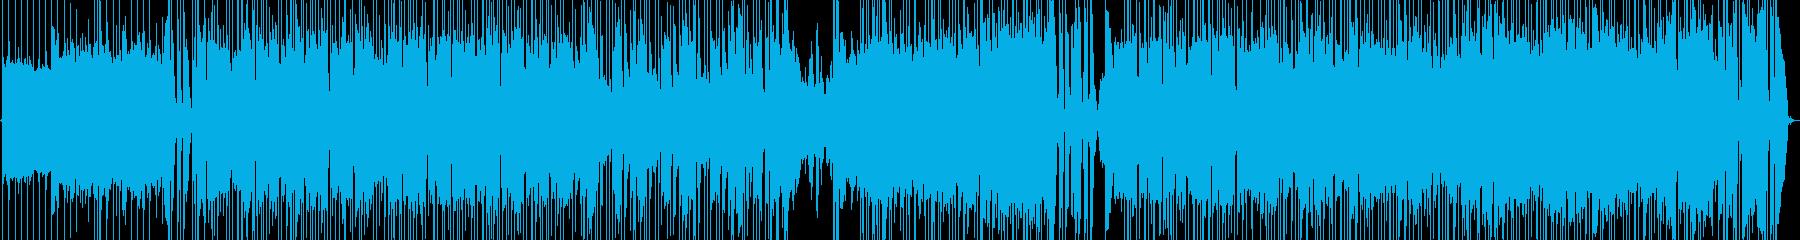 POPセンチメンタルなインスト曲の再生済みの波形